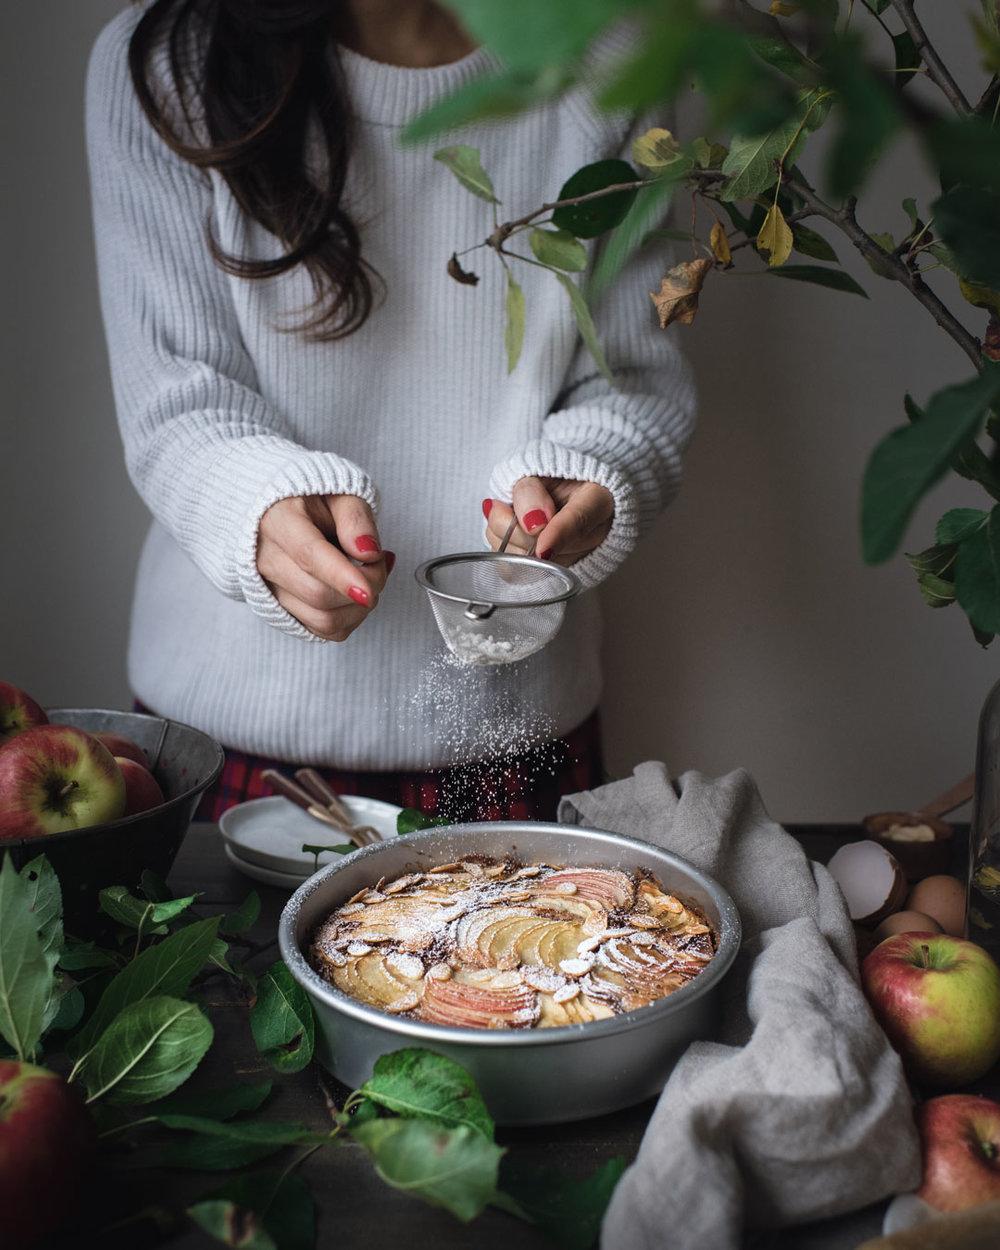 spiced apple cake 2-5343-4.jpg